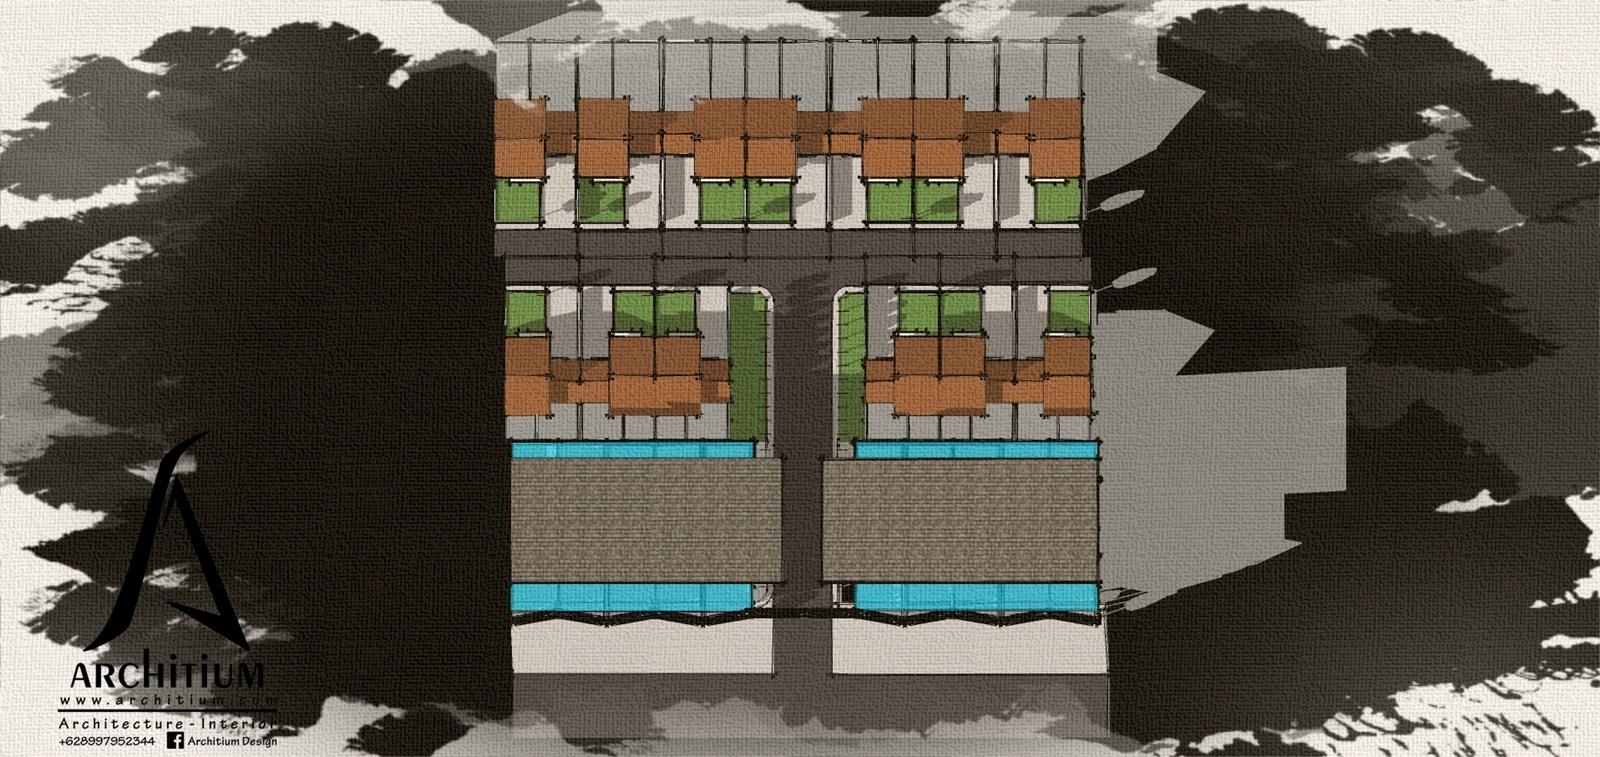 Architecture-House-Bandung-Ciganitri-Cluster-Siteplan